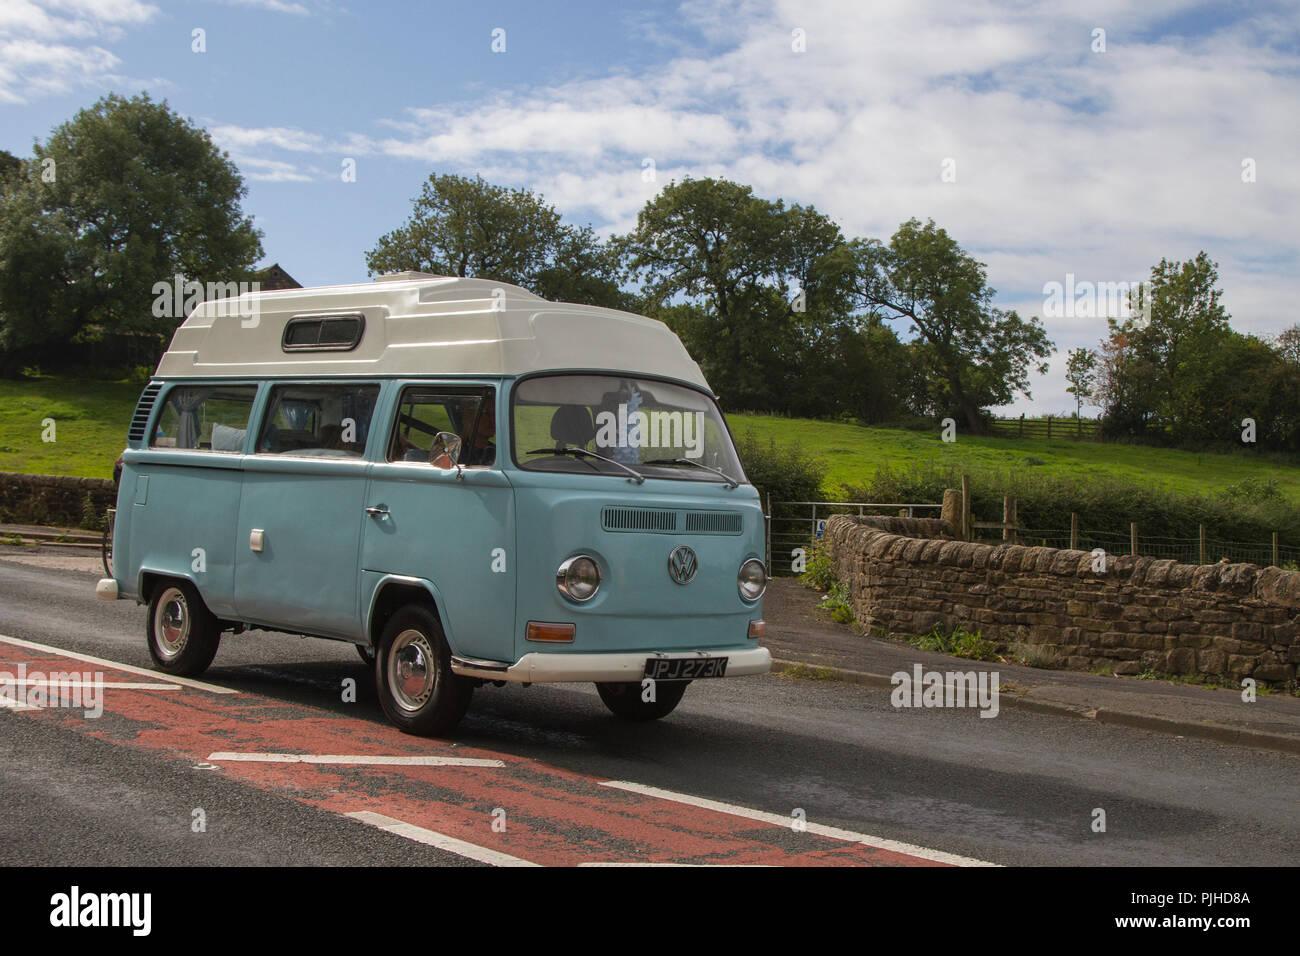 Blue Volkswagen Motor Caravan Classic, vintage, veteran, cars of yesteryear, restored collectibles at Hoghton Towers Car Rally, UK - Stock Image